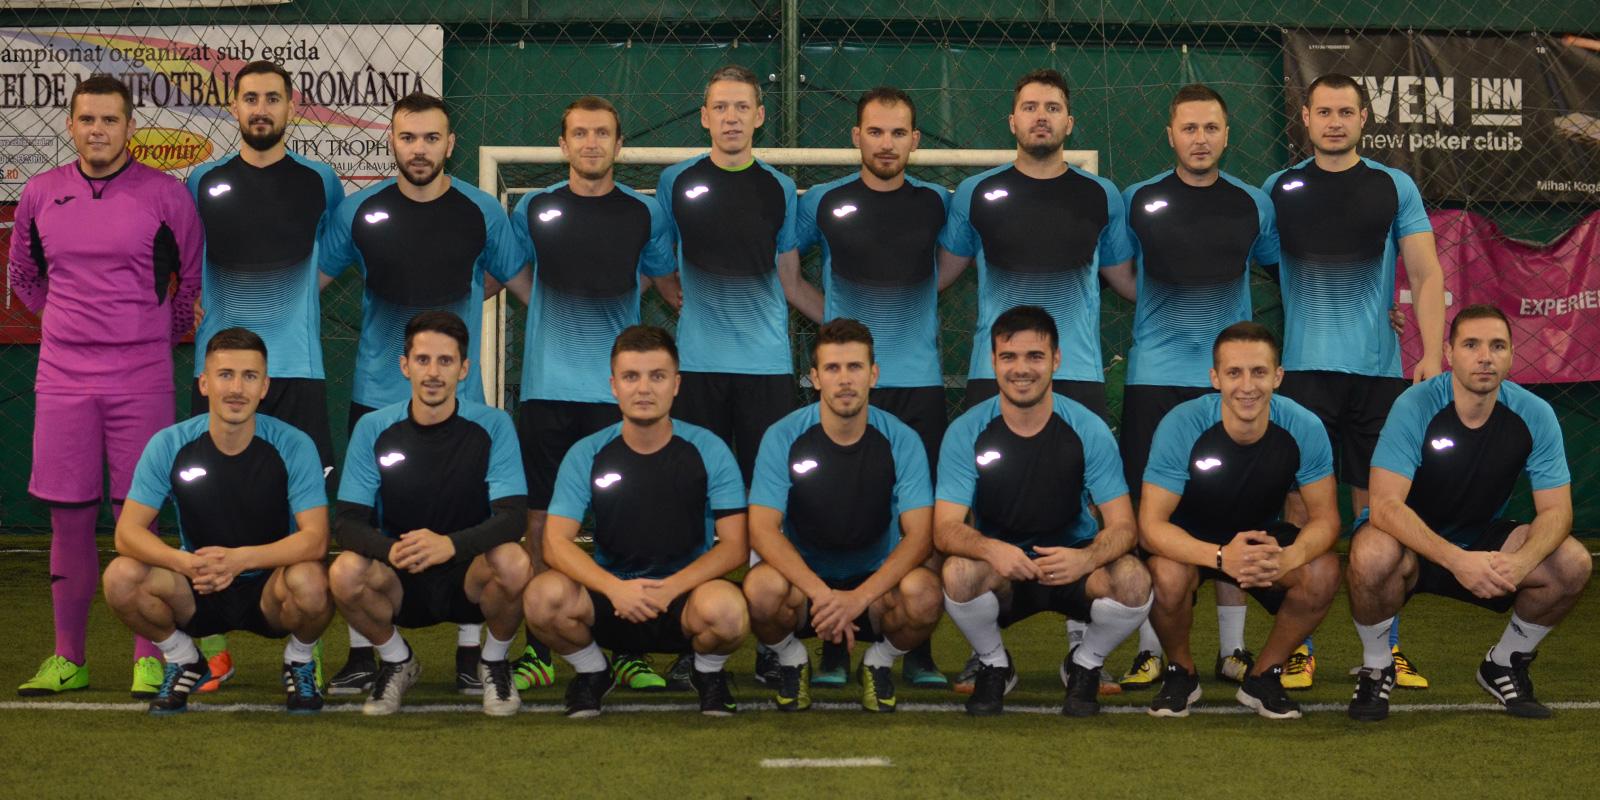 dream team minifotbal brasov